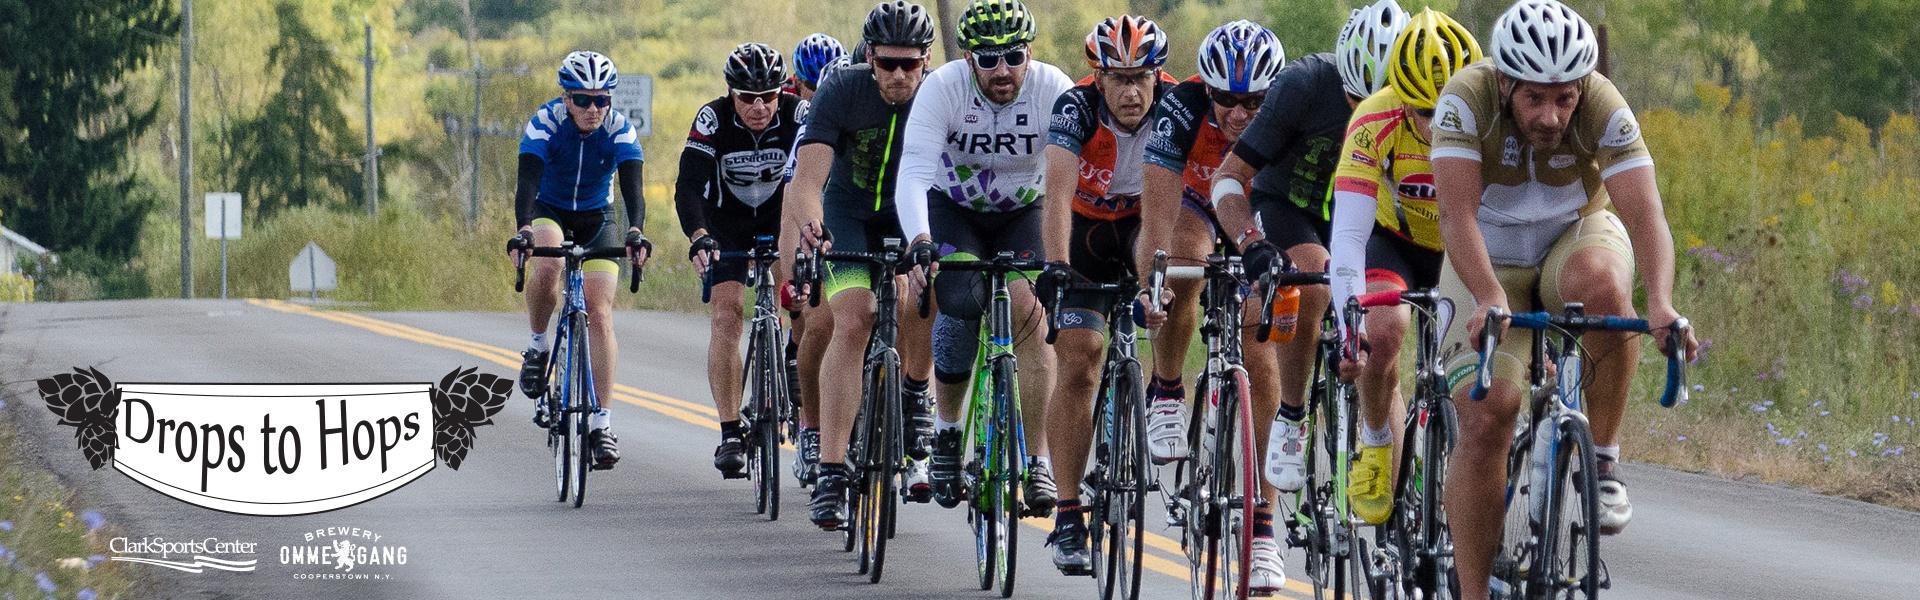 8th Annual Drops to Hops Bike Race